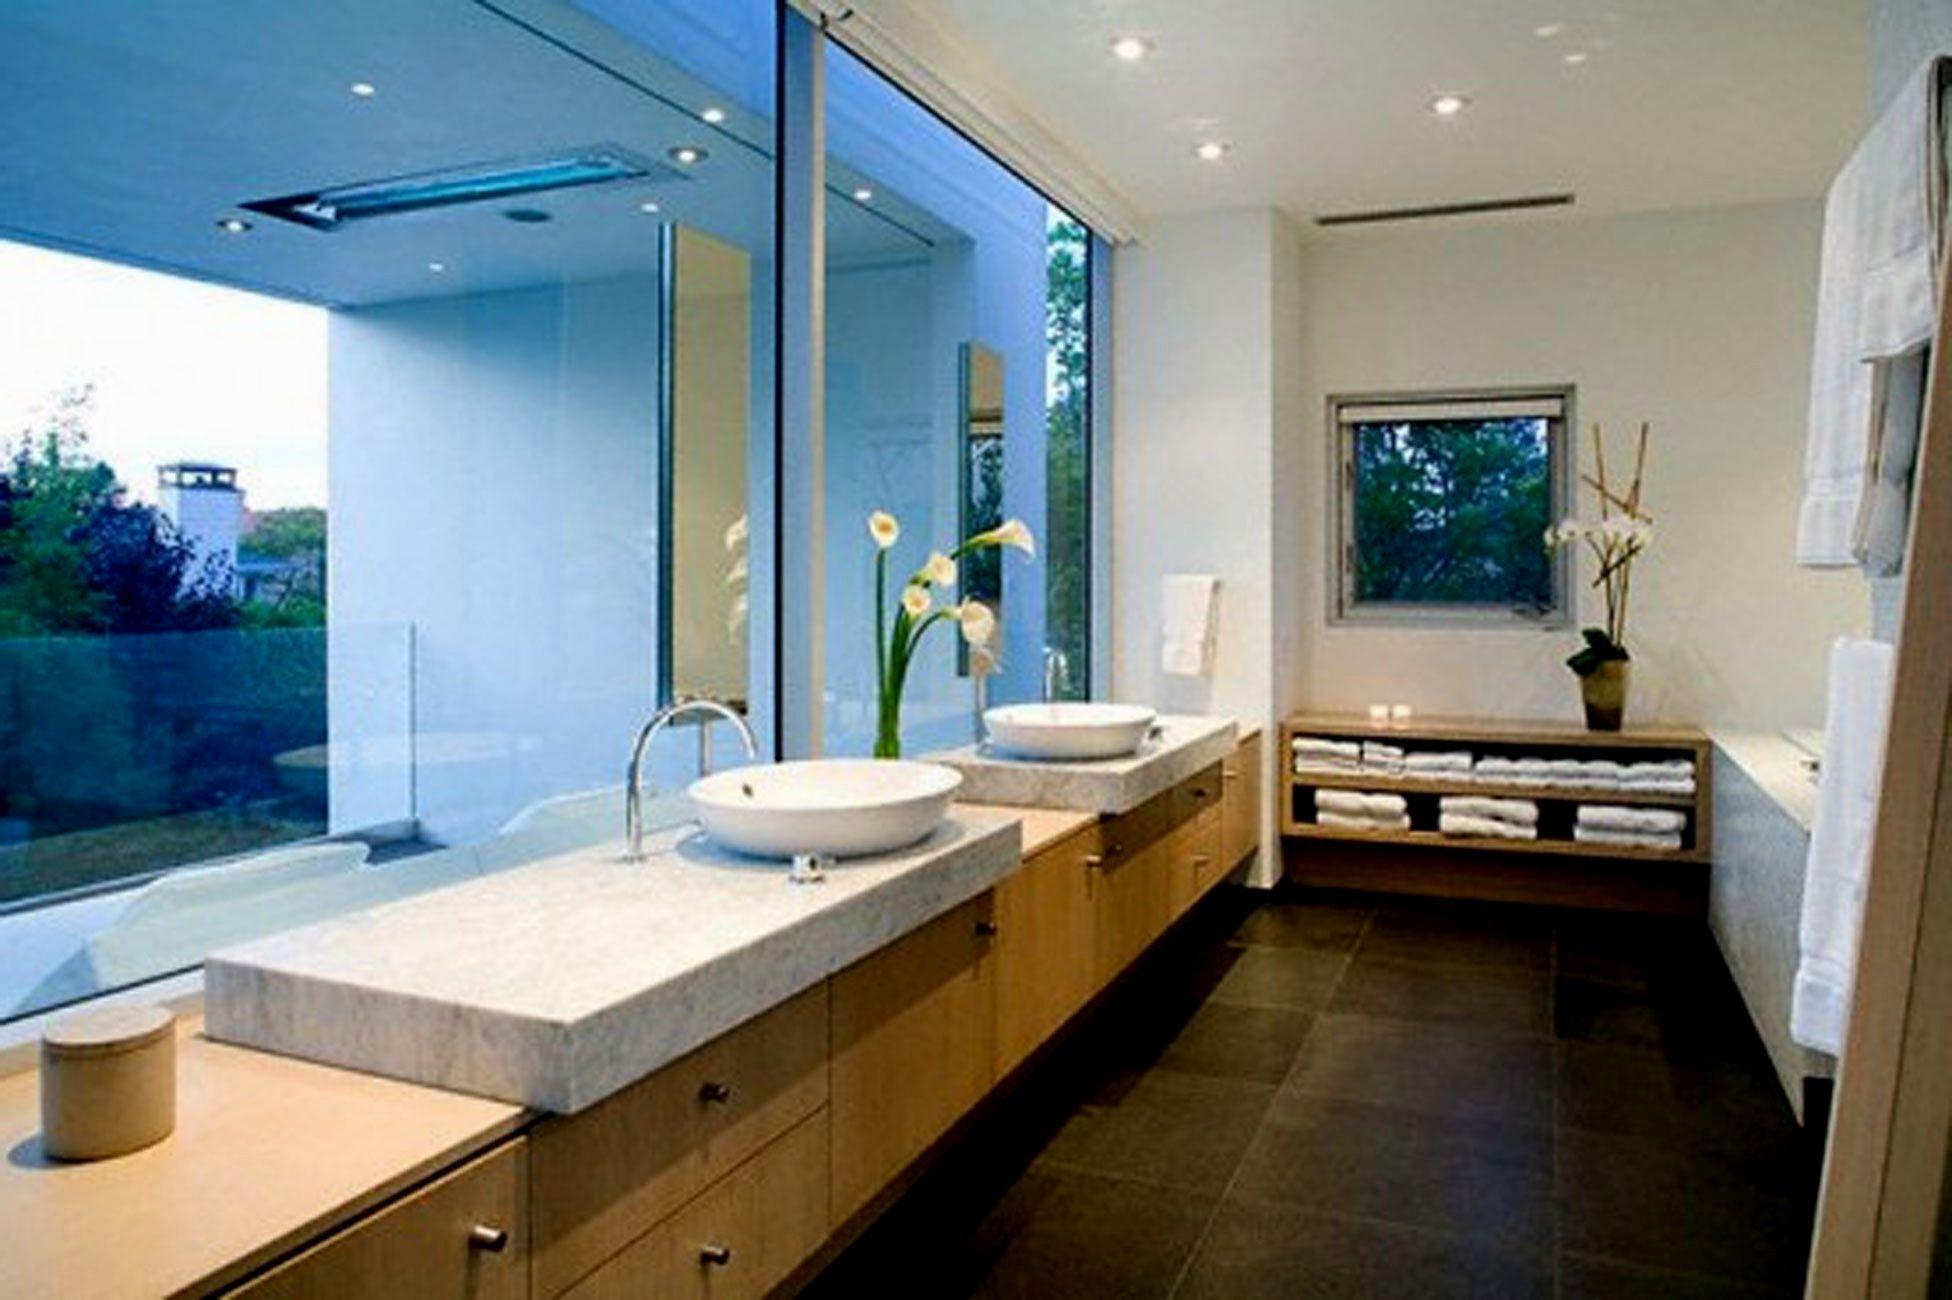 terrific 8x8 bathroom layout image-Unique 8×8 Bathroom Layout Model